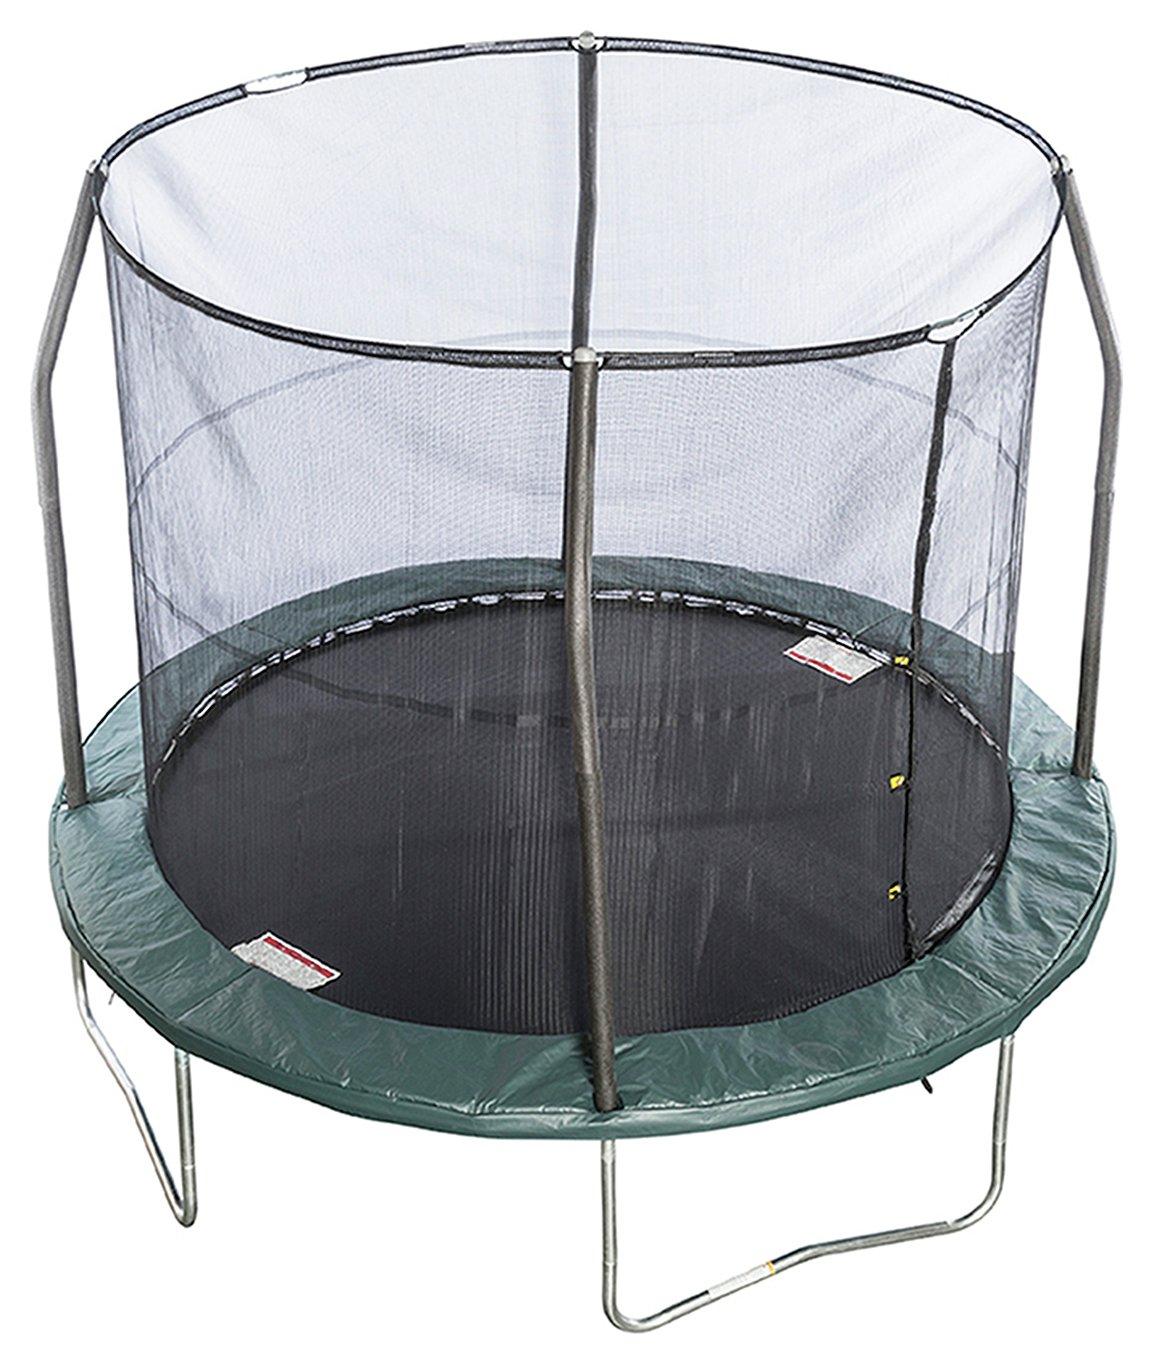 jumpking 10ft premium trampoline